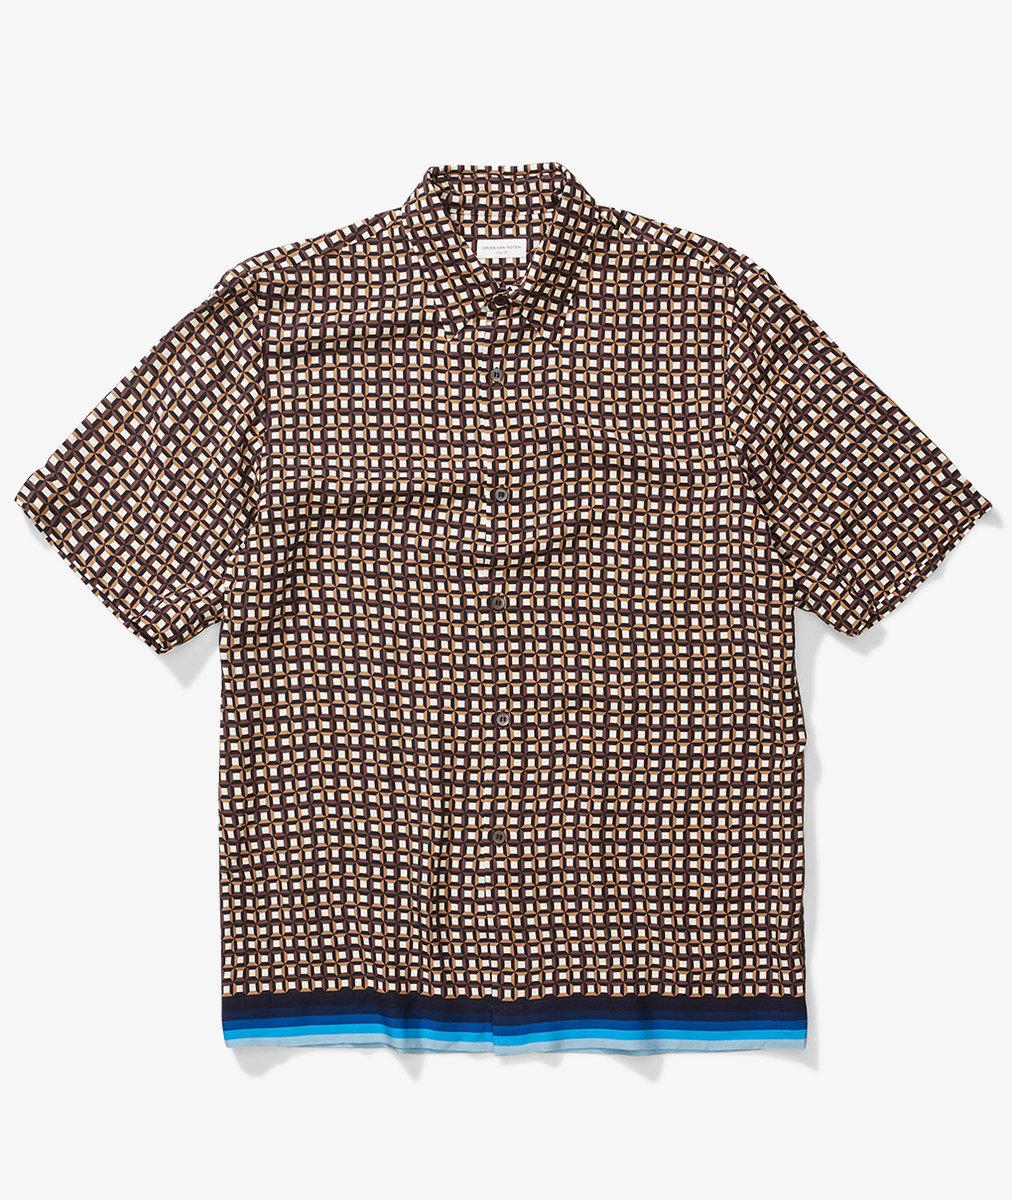 dries-van-noten-clasen-shirt_u.jpg